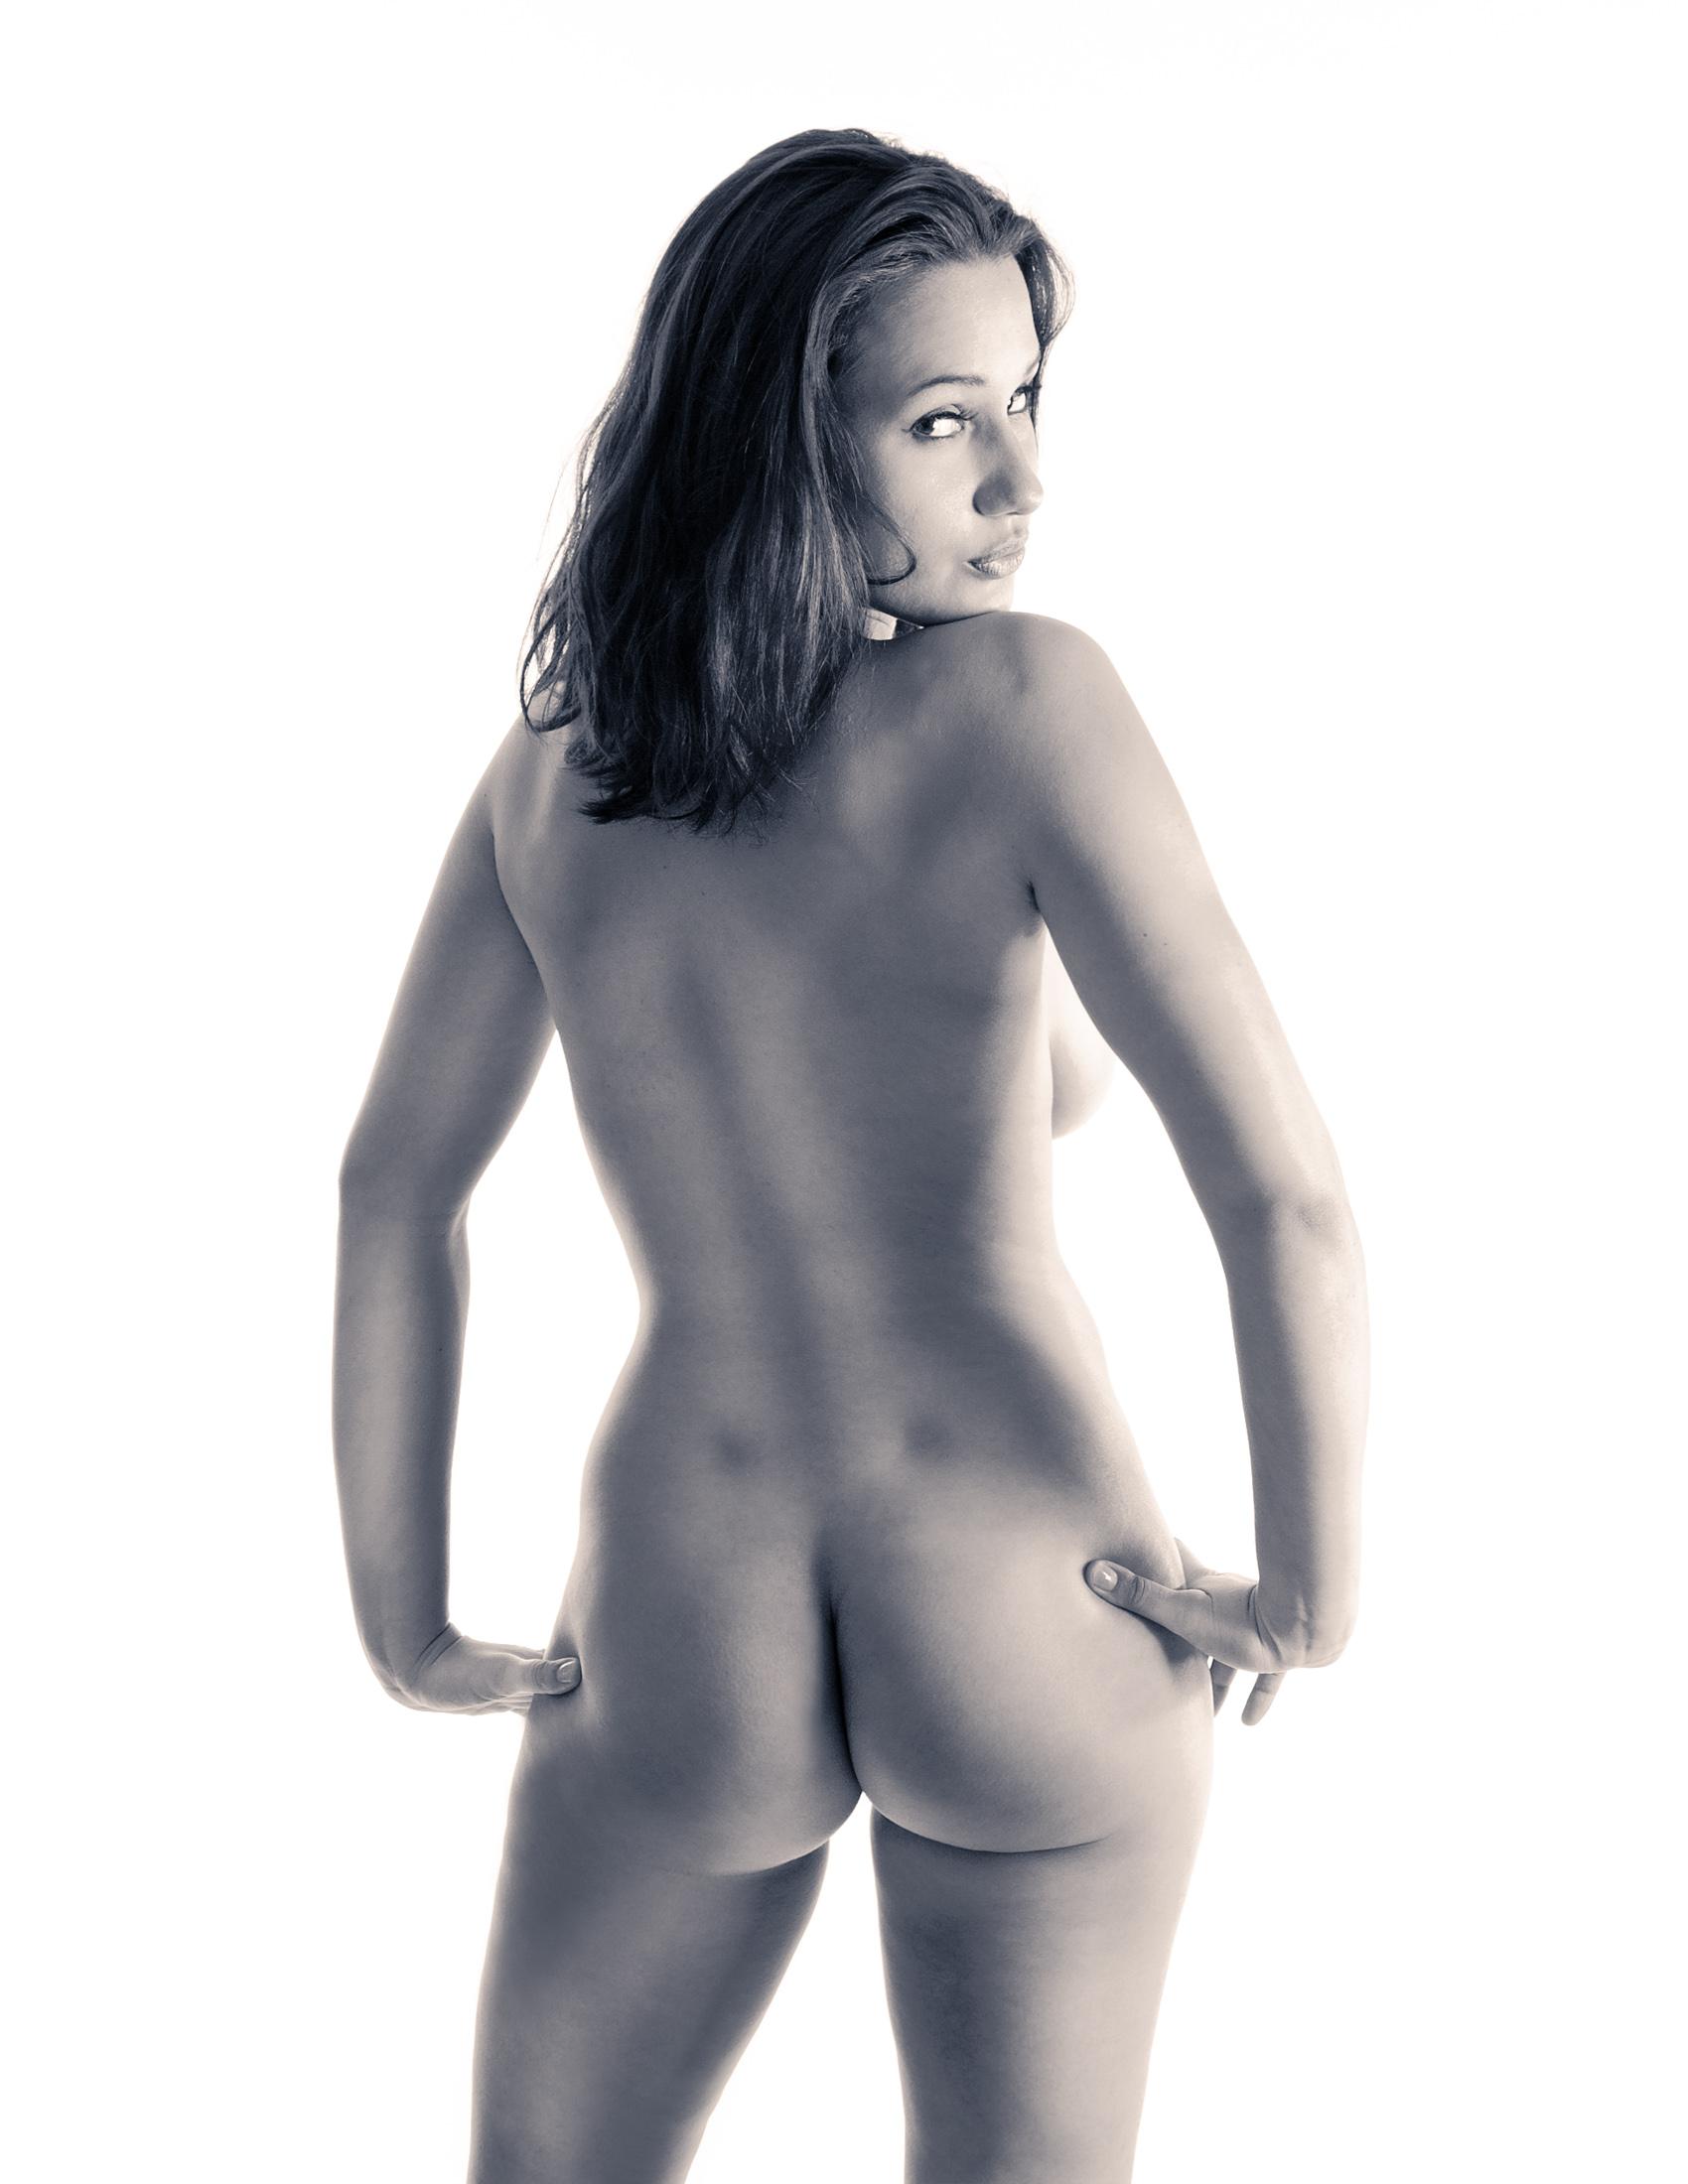 Fine art nude photography erotic pin-up girl